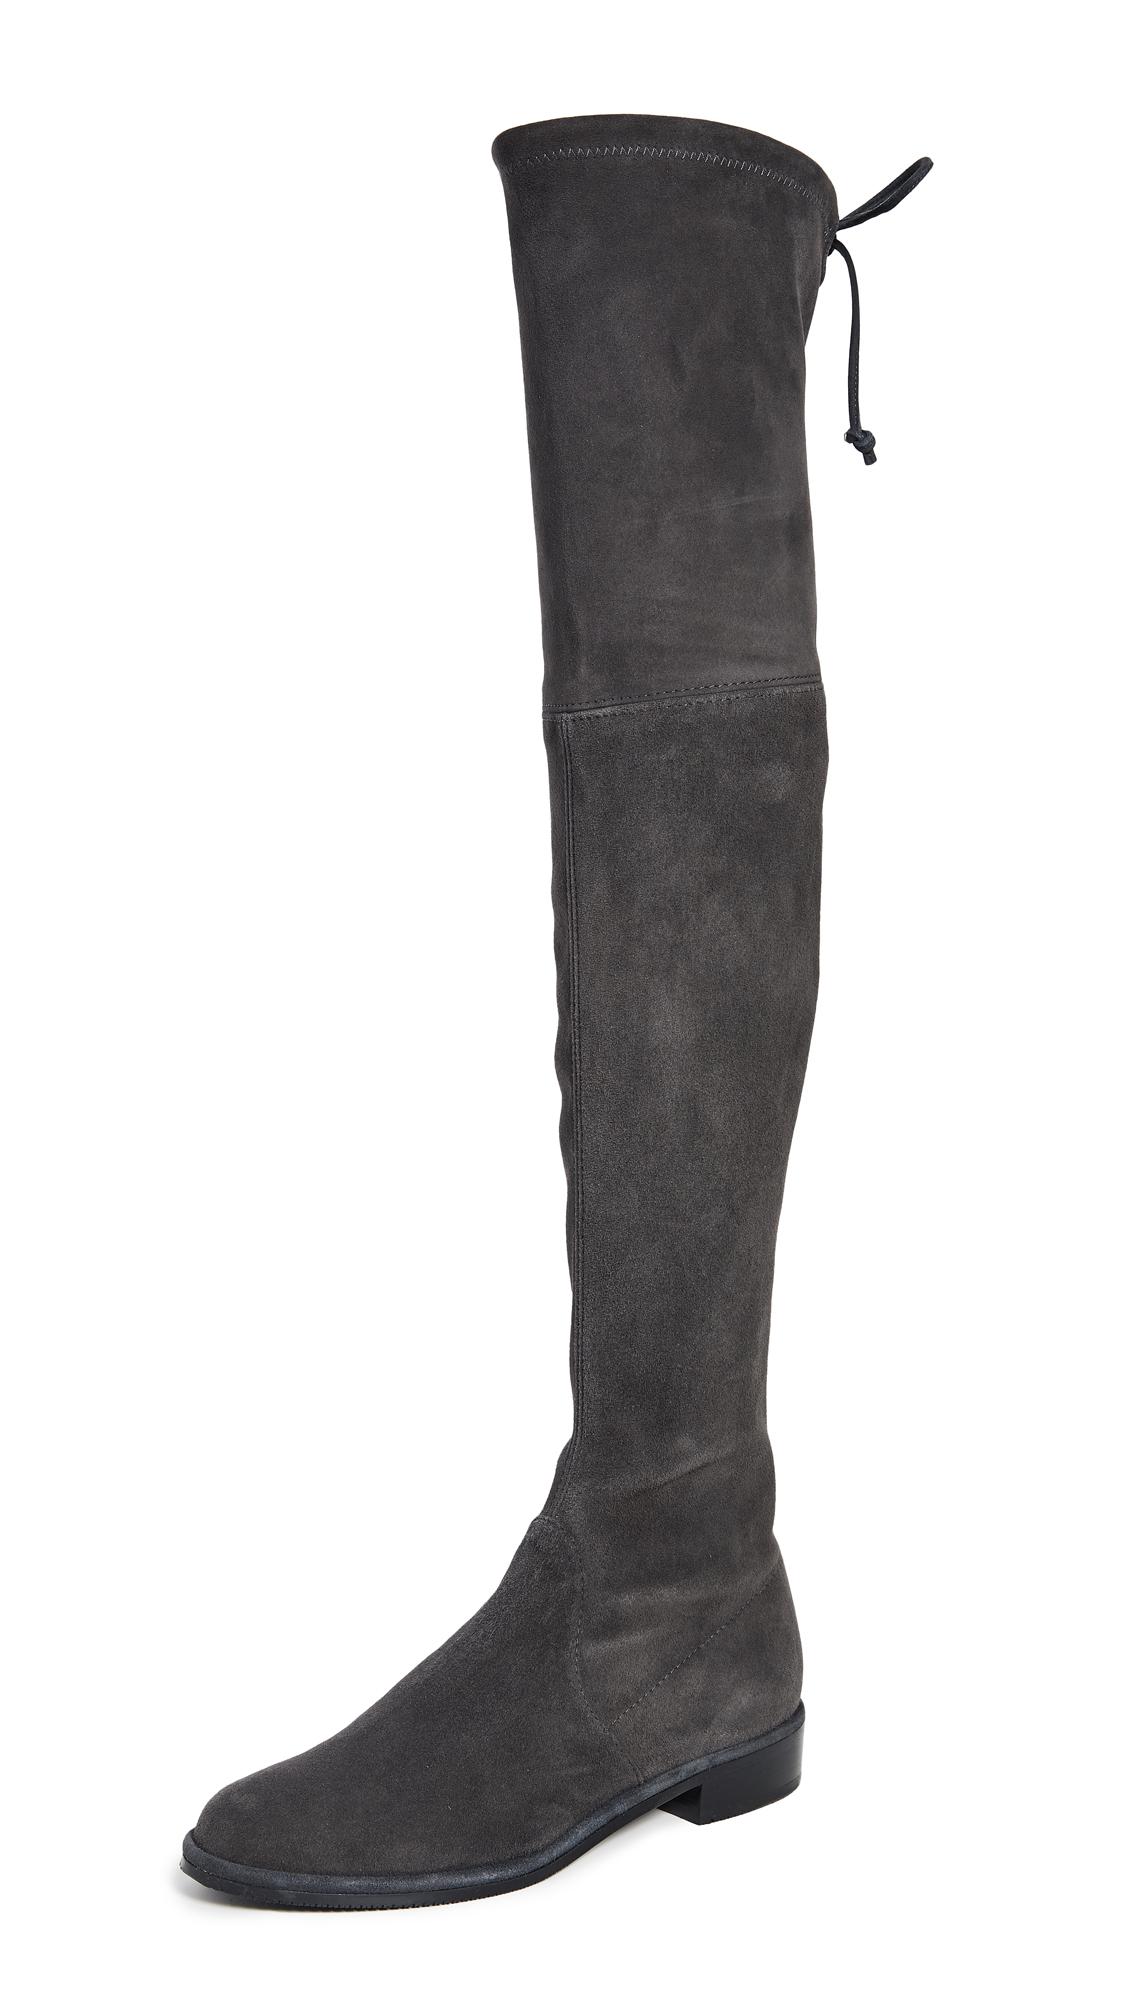 Stuart Weitzman Lowland Over The Knee Boots - Slate